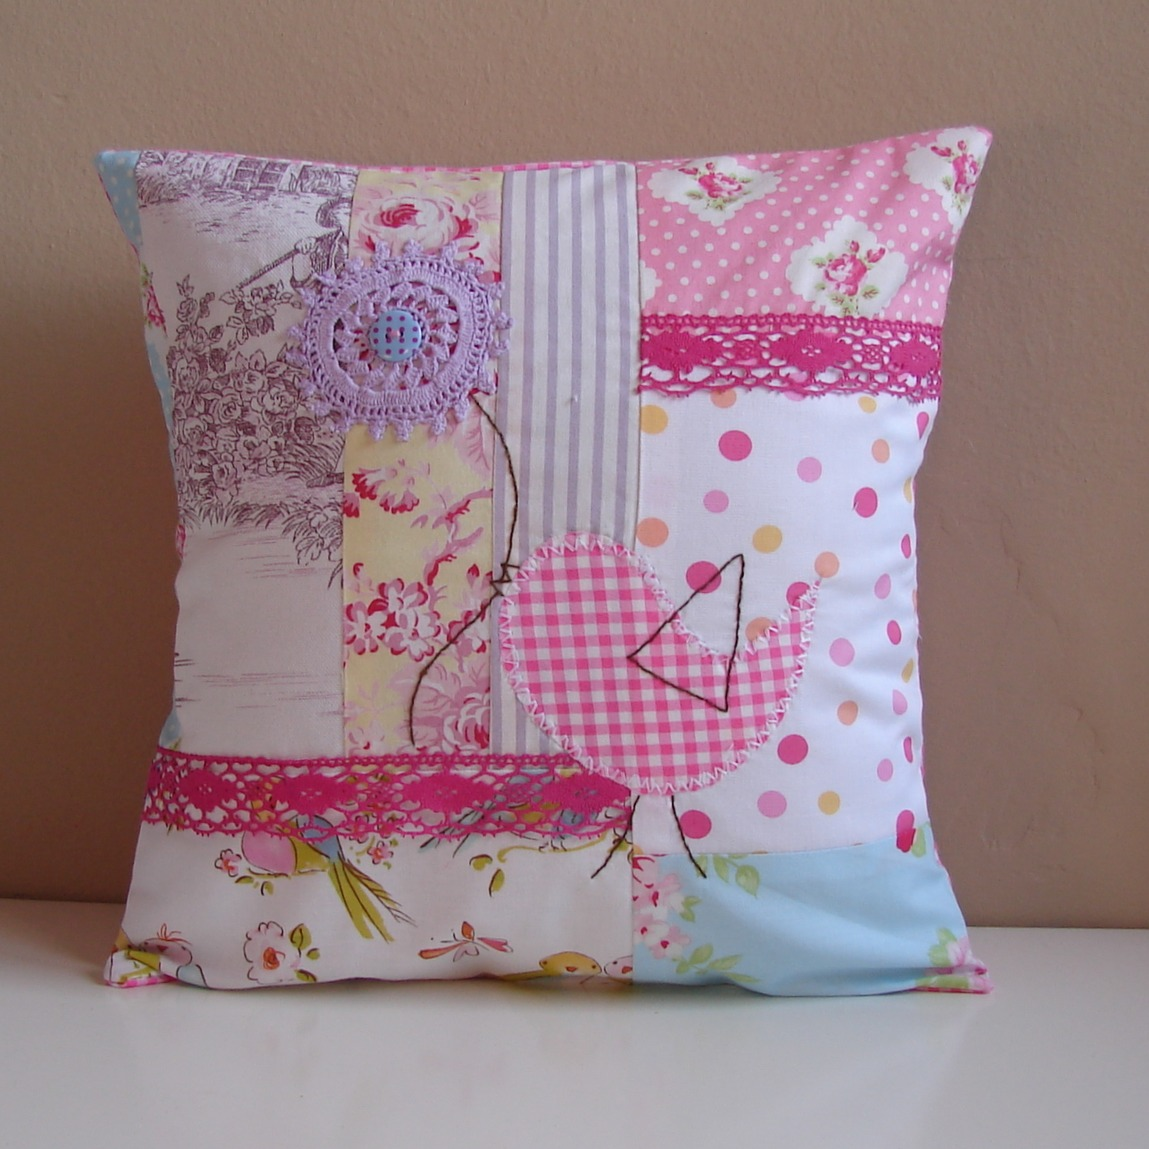 More cushion for the pushin 02 scene 2